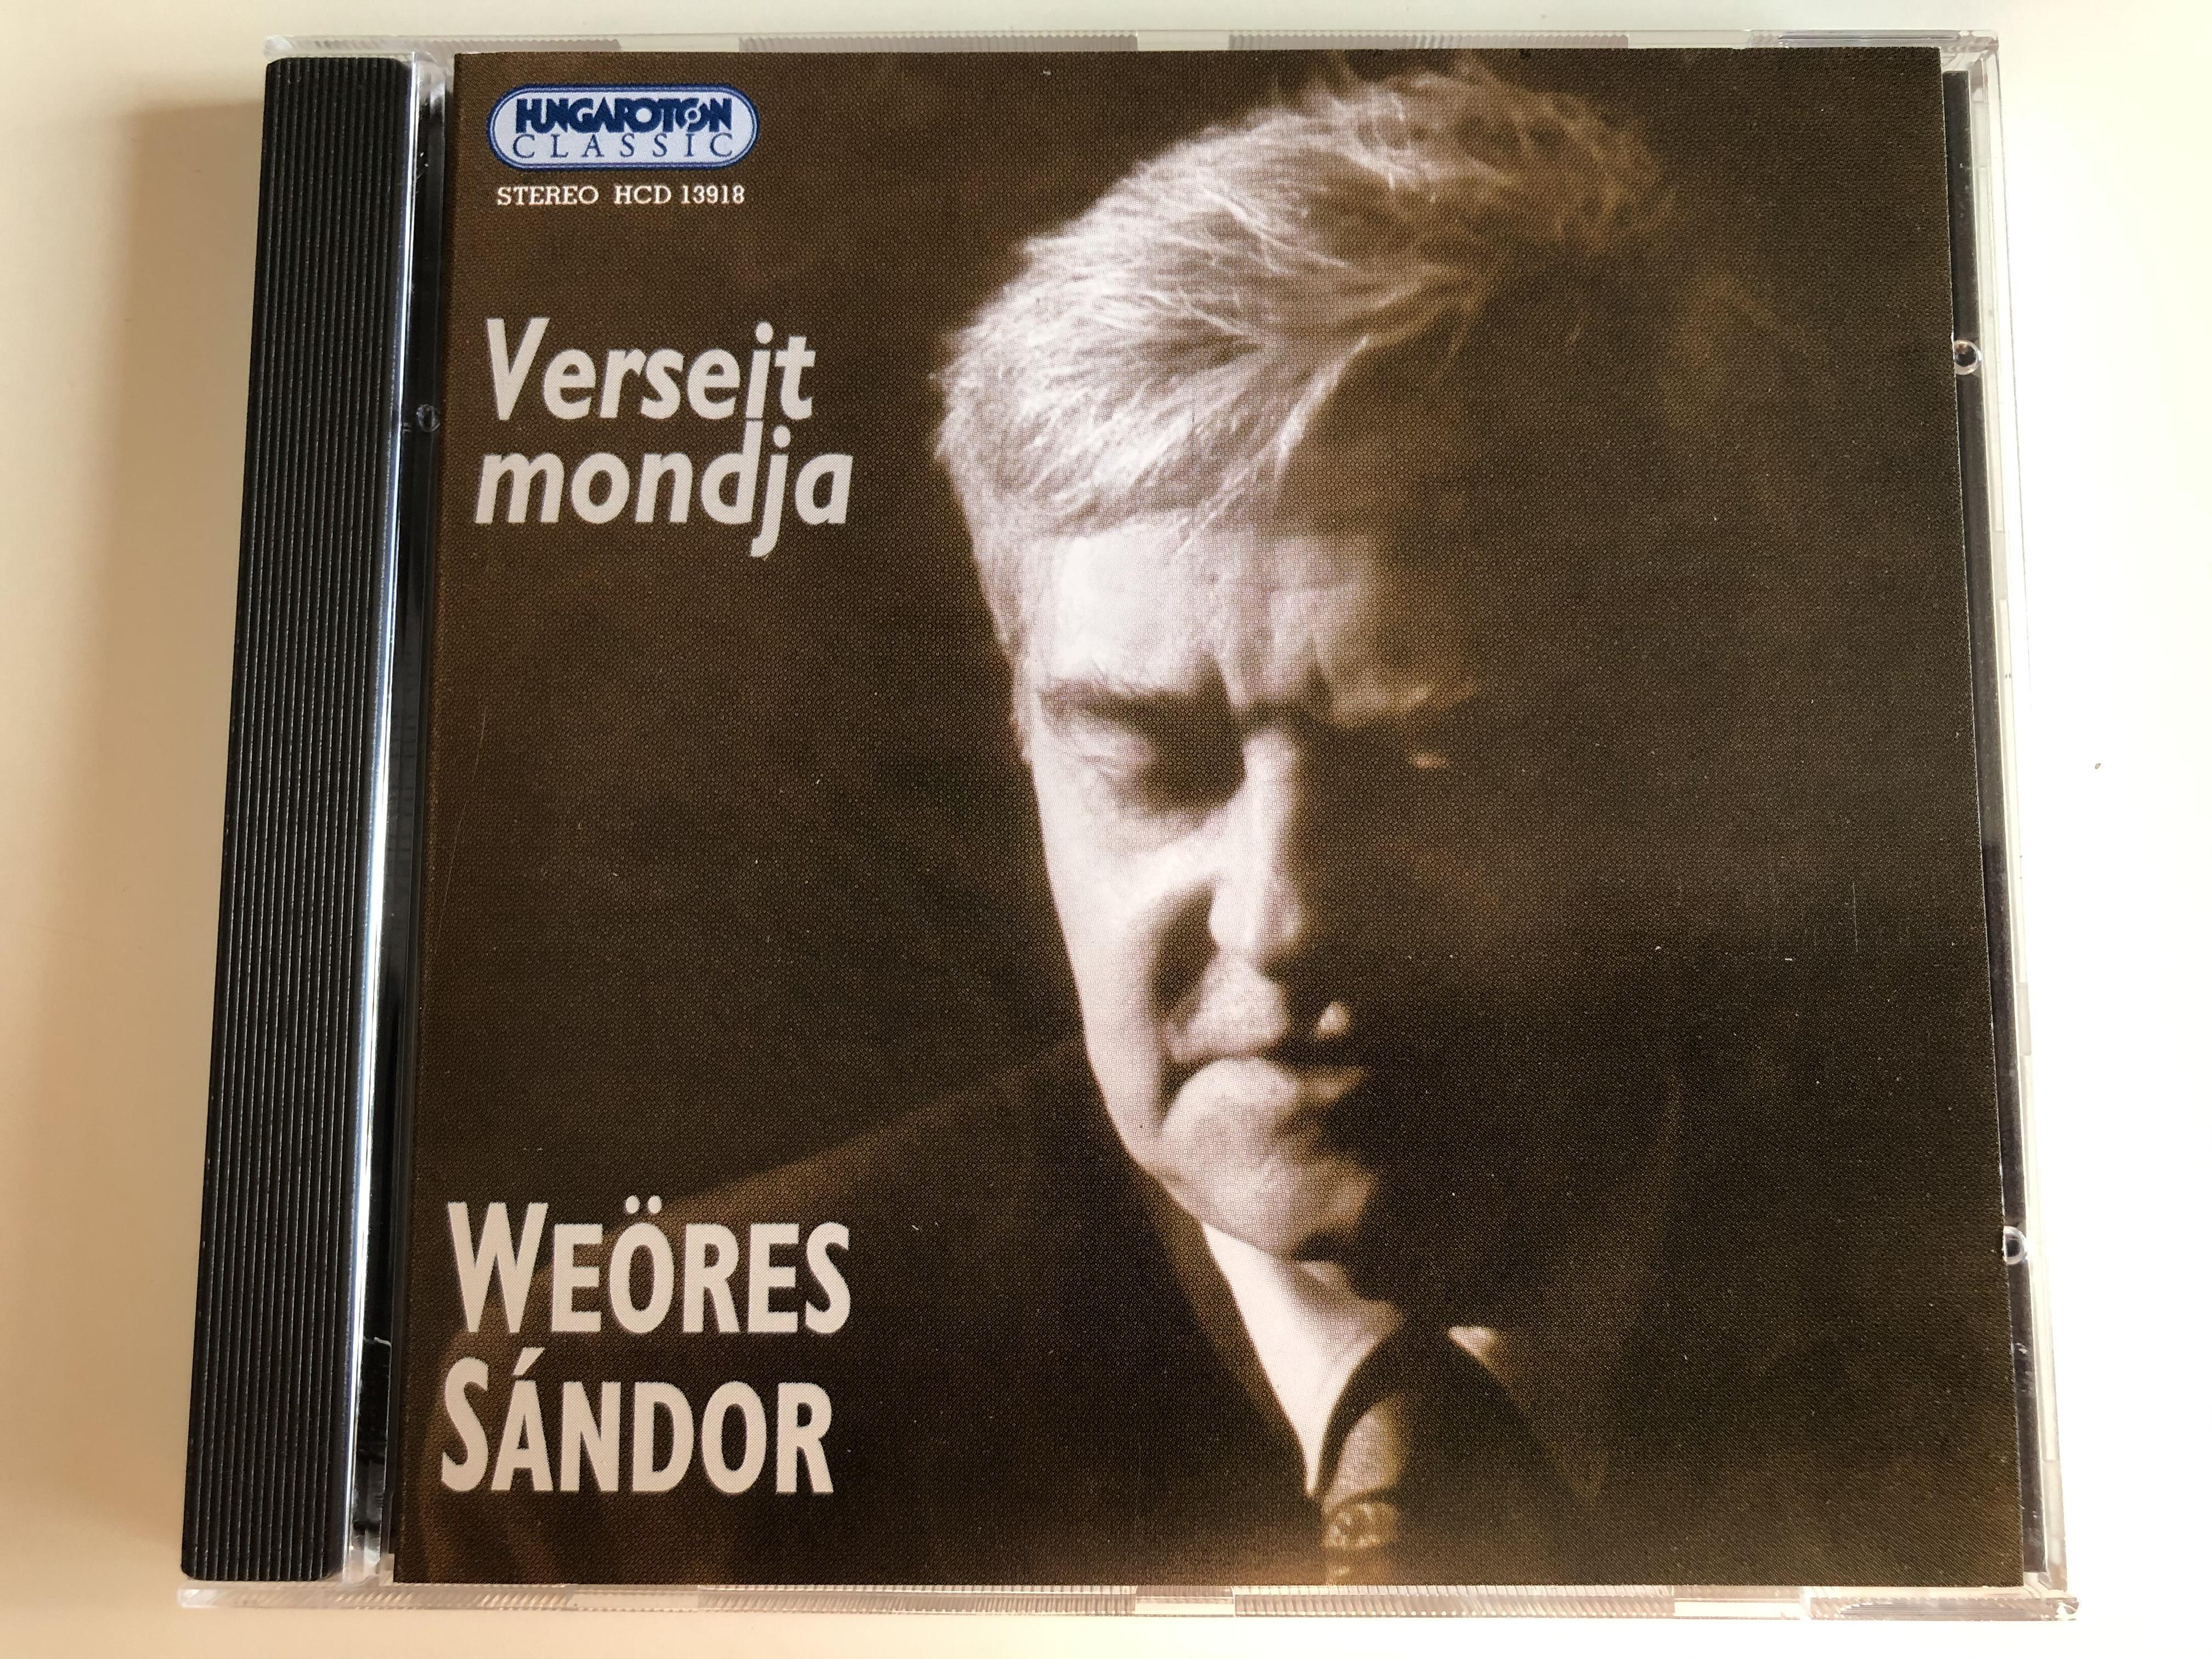 verseit-mondja-weores-sandor-hungaroton-classic-audio-cd-1982-stereo-hcd-13918-1-.jpg